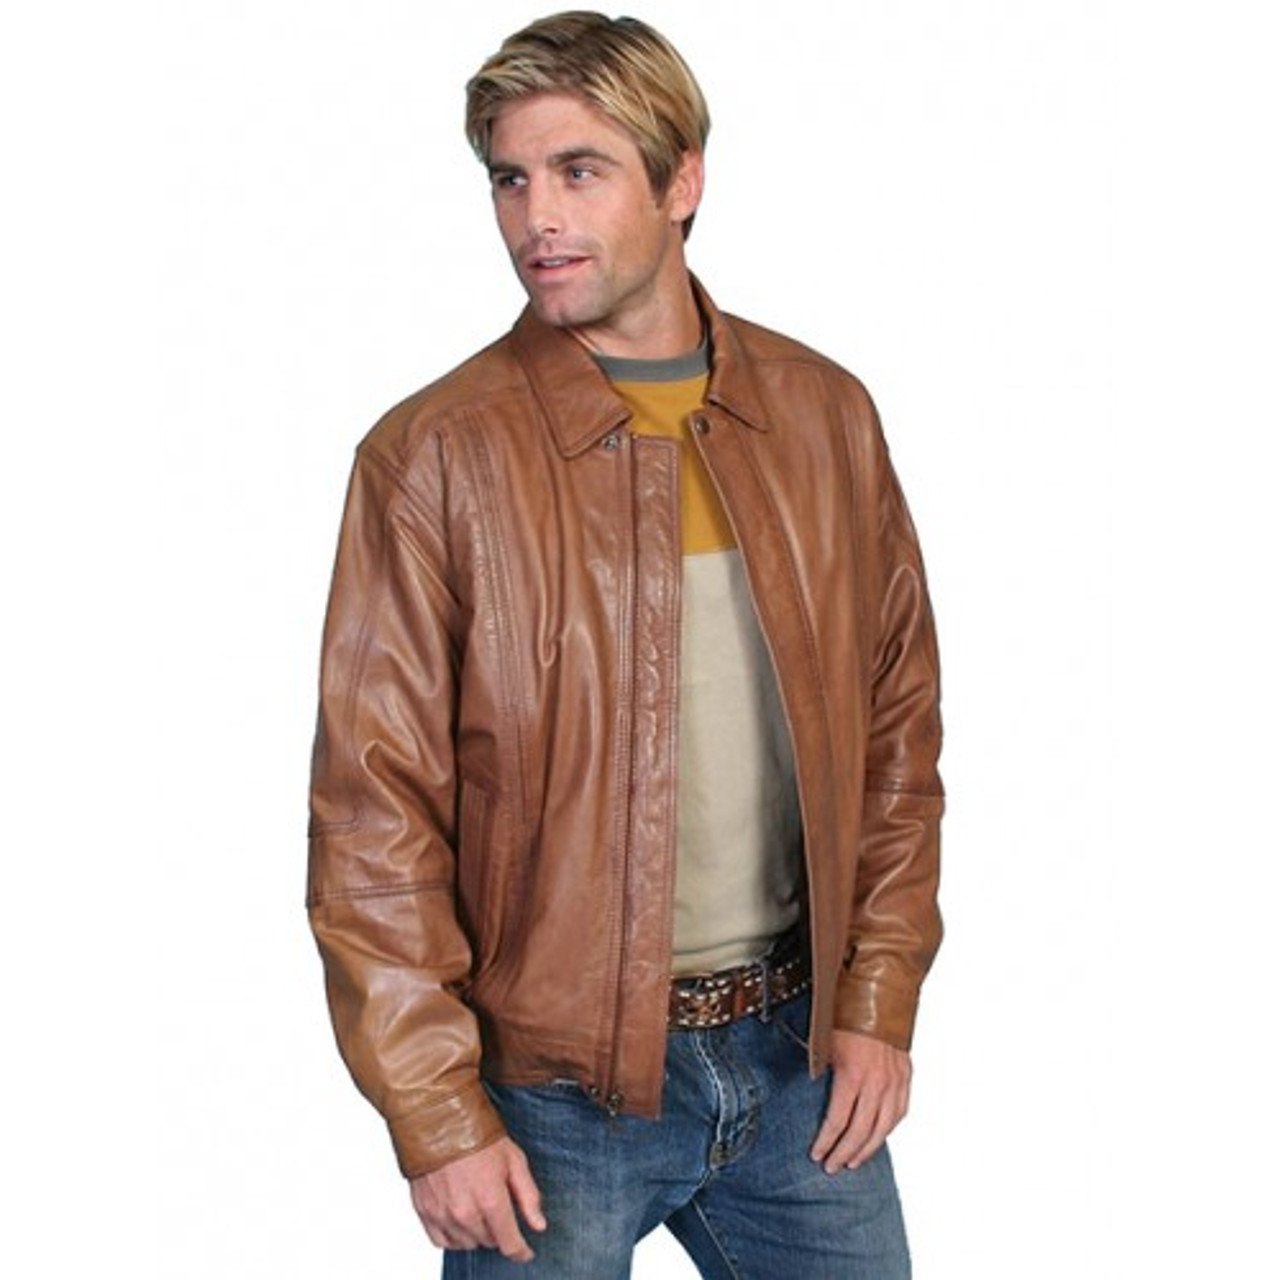 7a54768a3 Scully Men's Western Apparel - Premium Lambskin Jacket